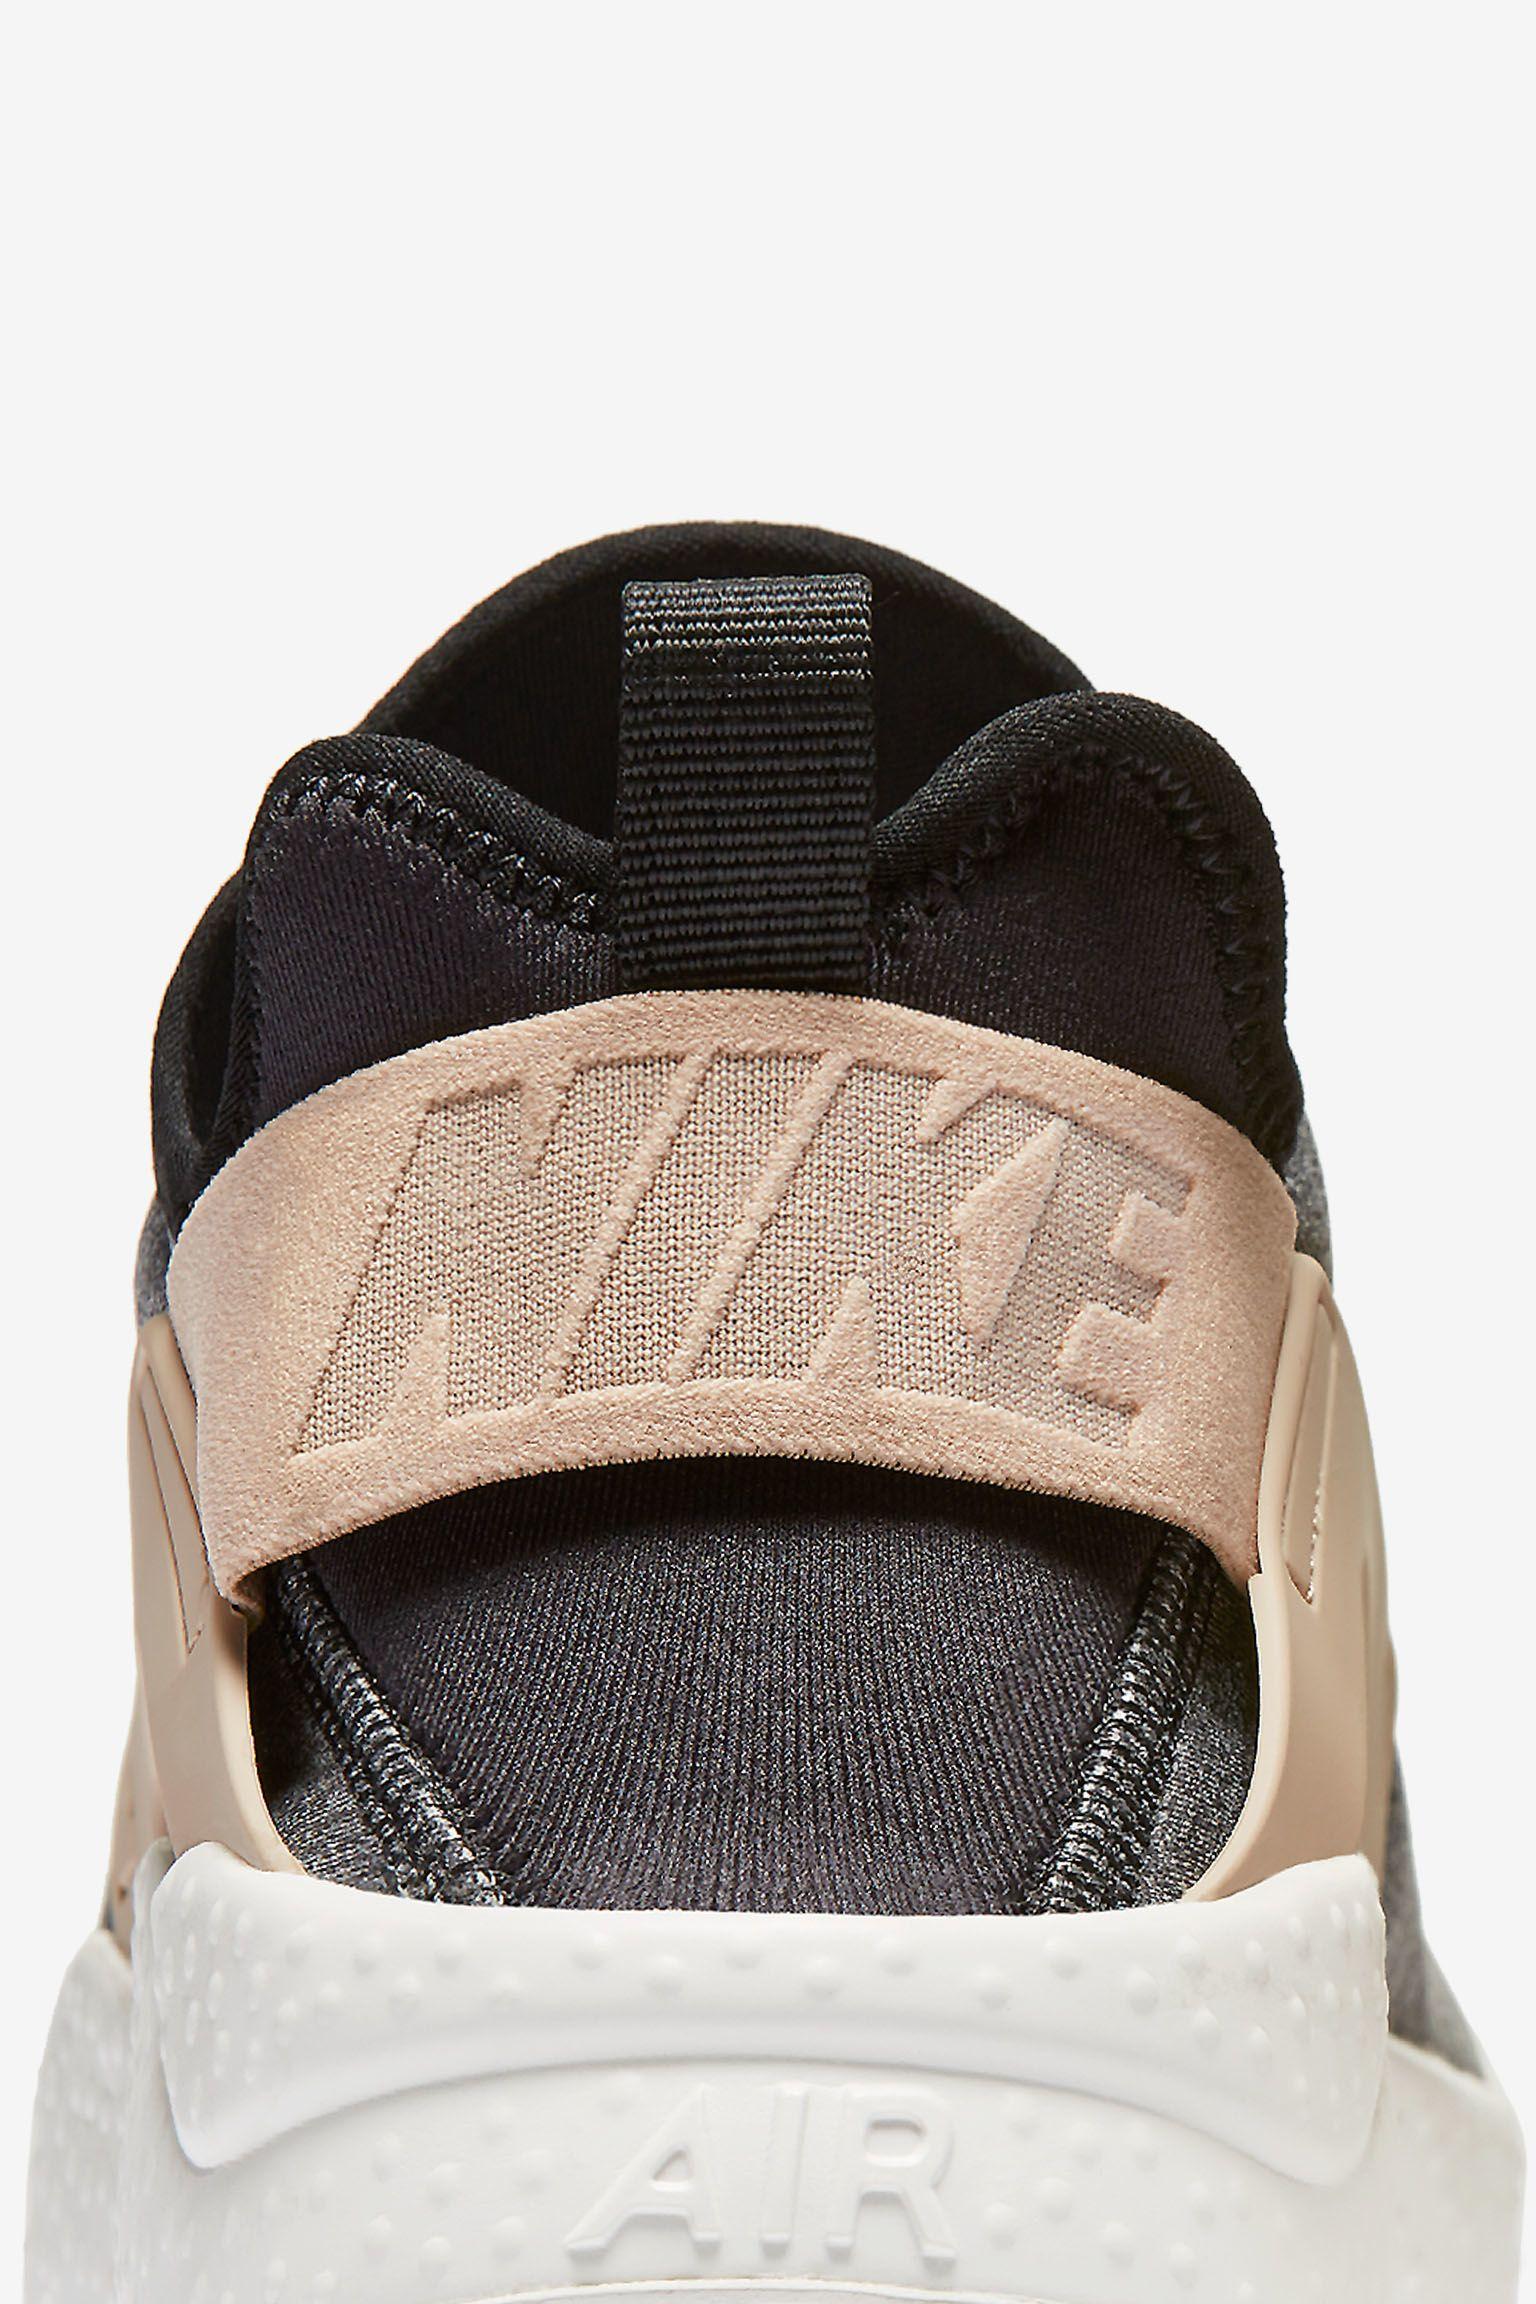 Women's Nike Air Huarache Ultra SE 'Black & Vachetta Tan'